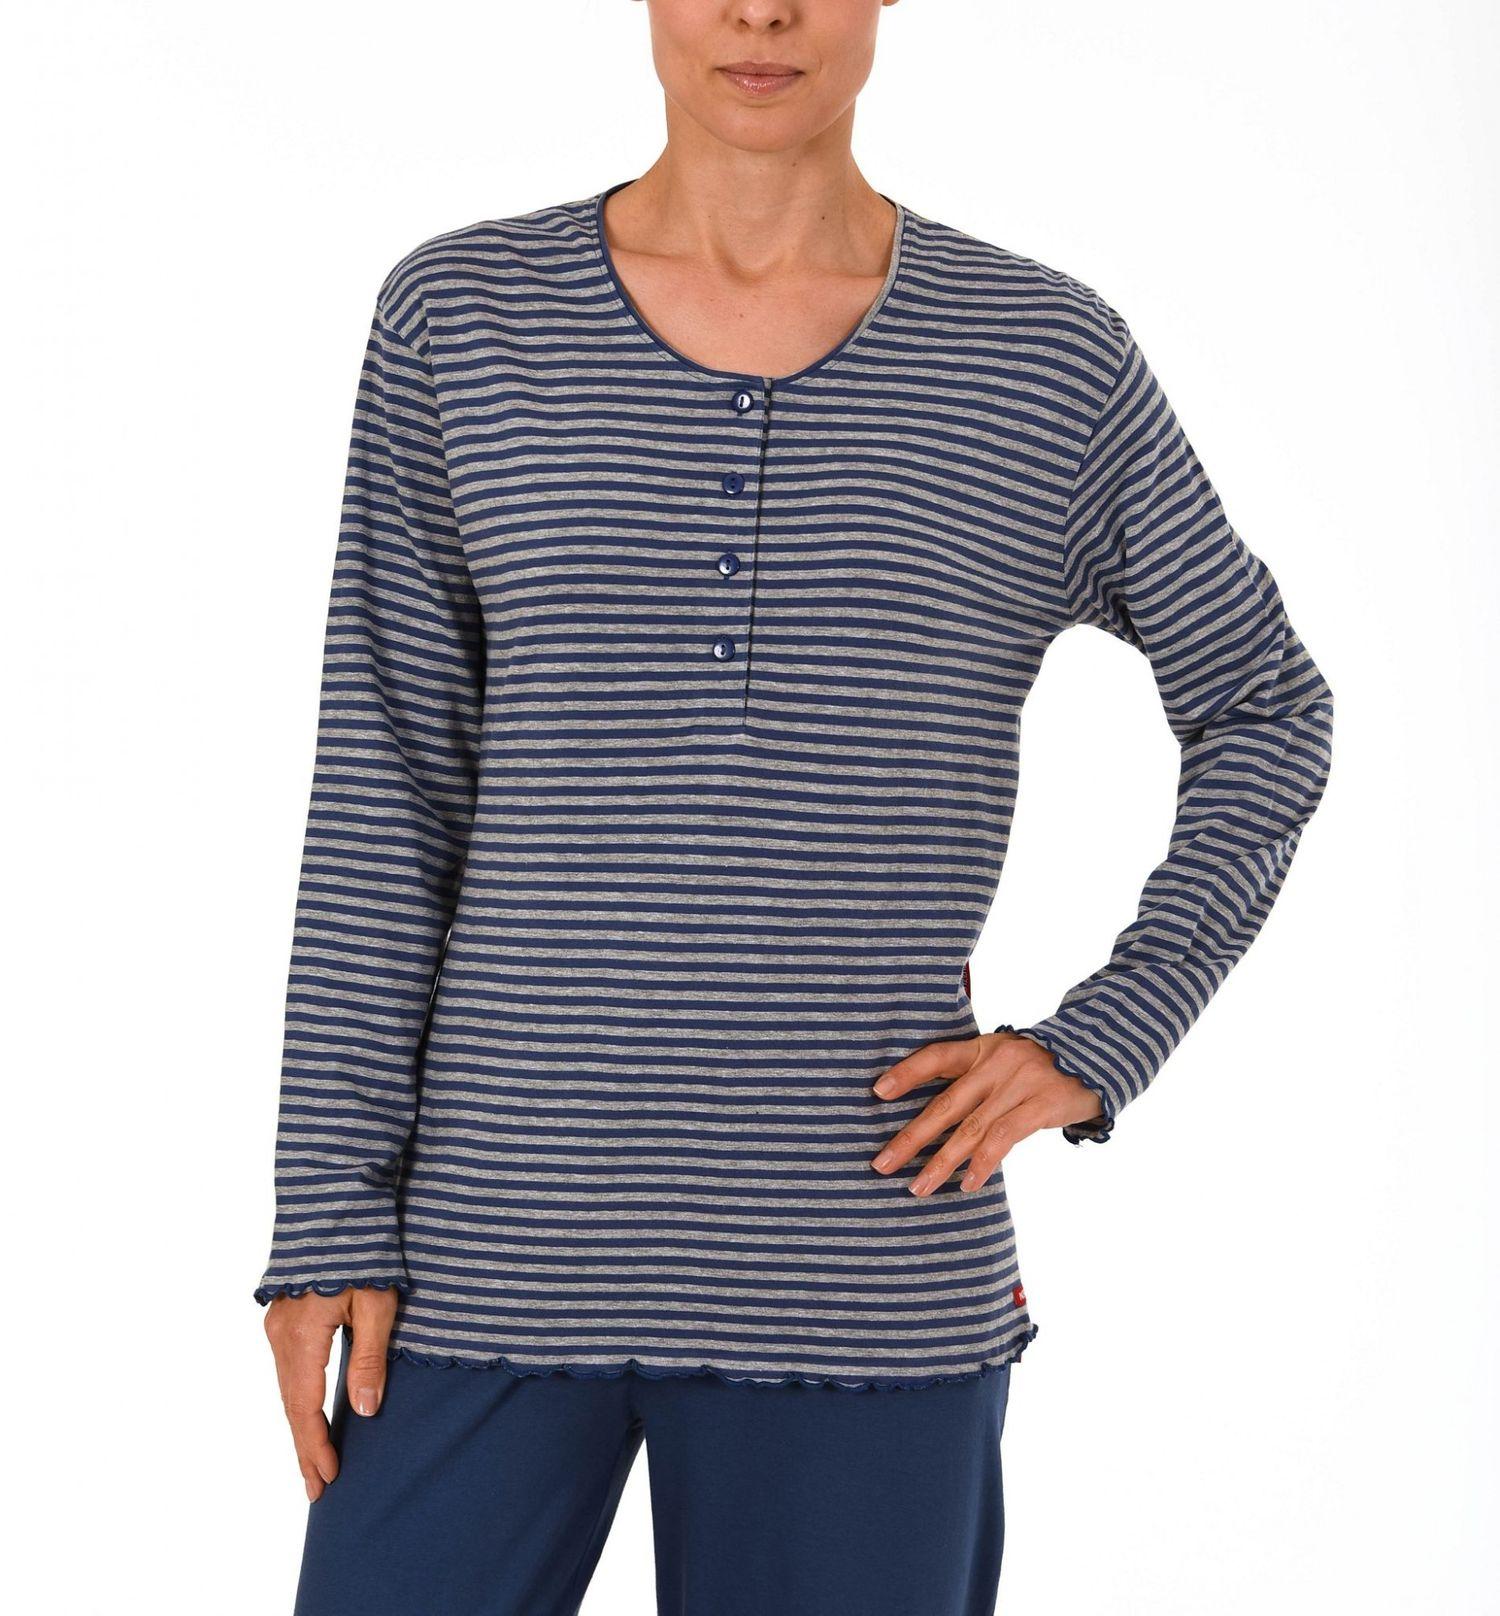 Damen Shirt  Oberteil - langarm Mix & Match Streifendesign – 261 219 90 105